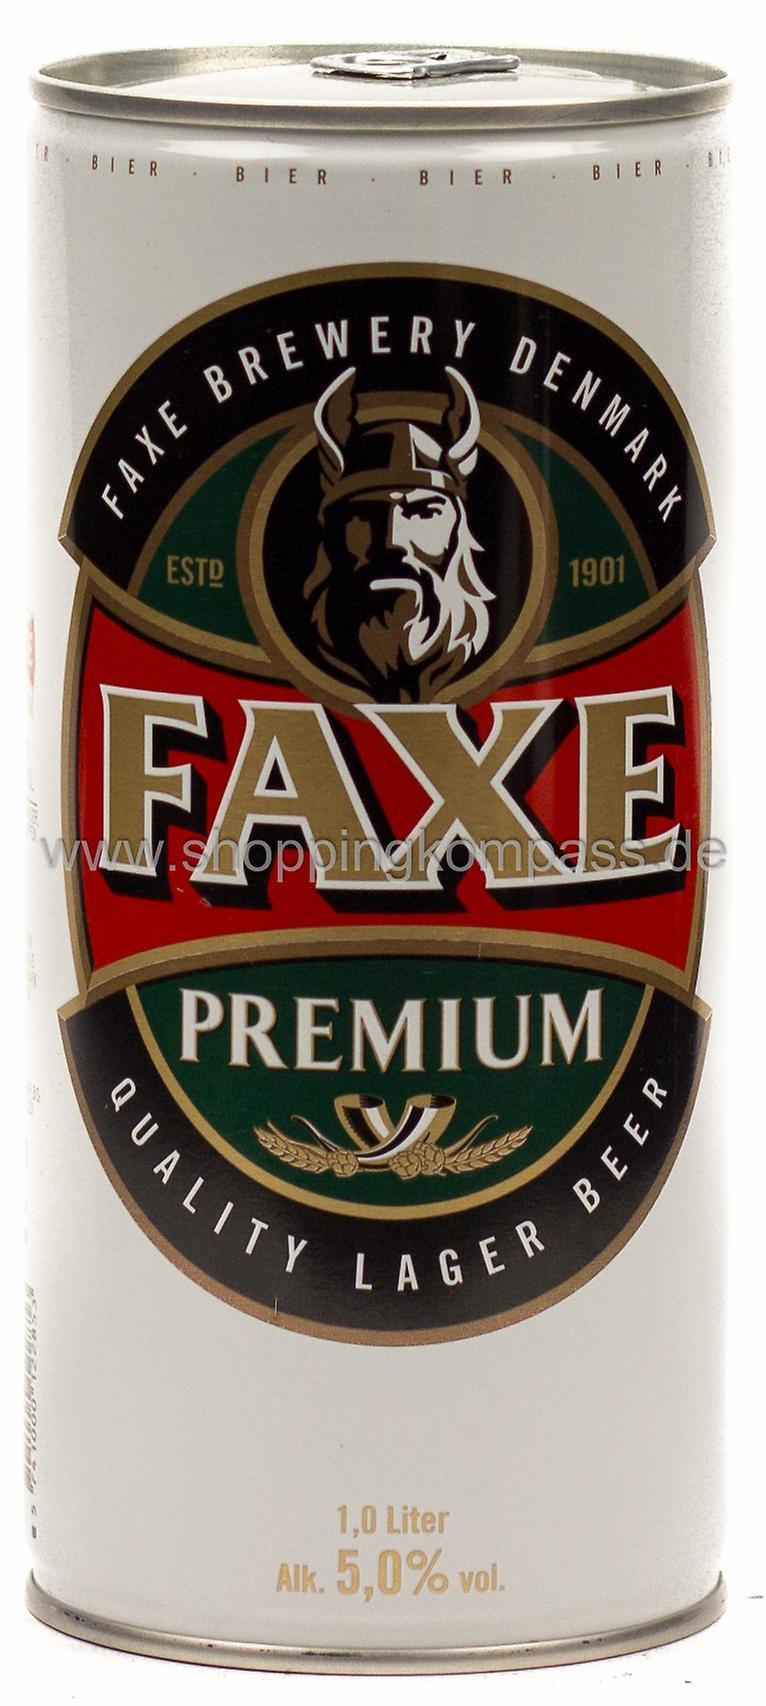 Faxe Premium 1 L Dose Einweg